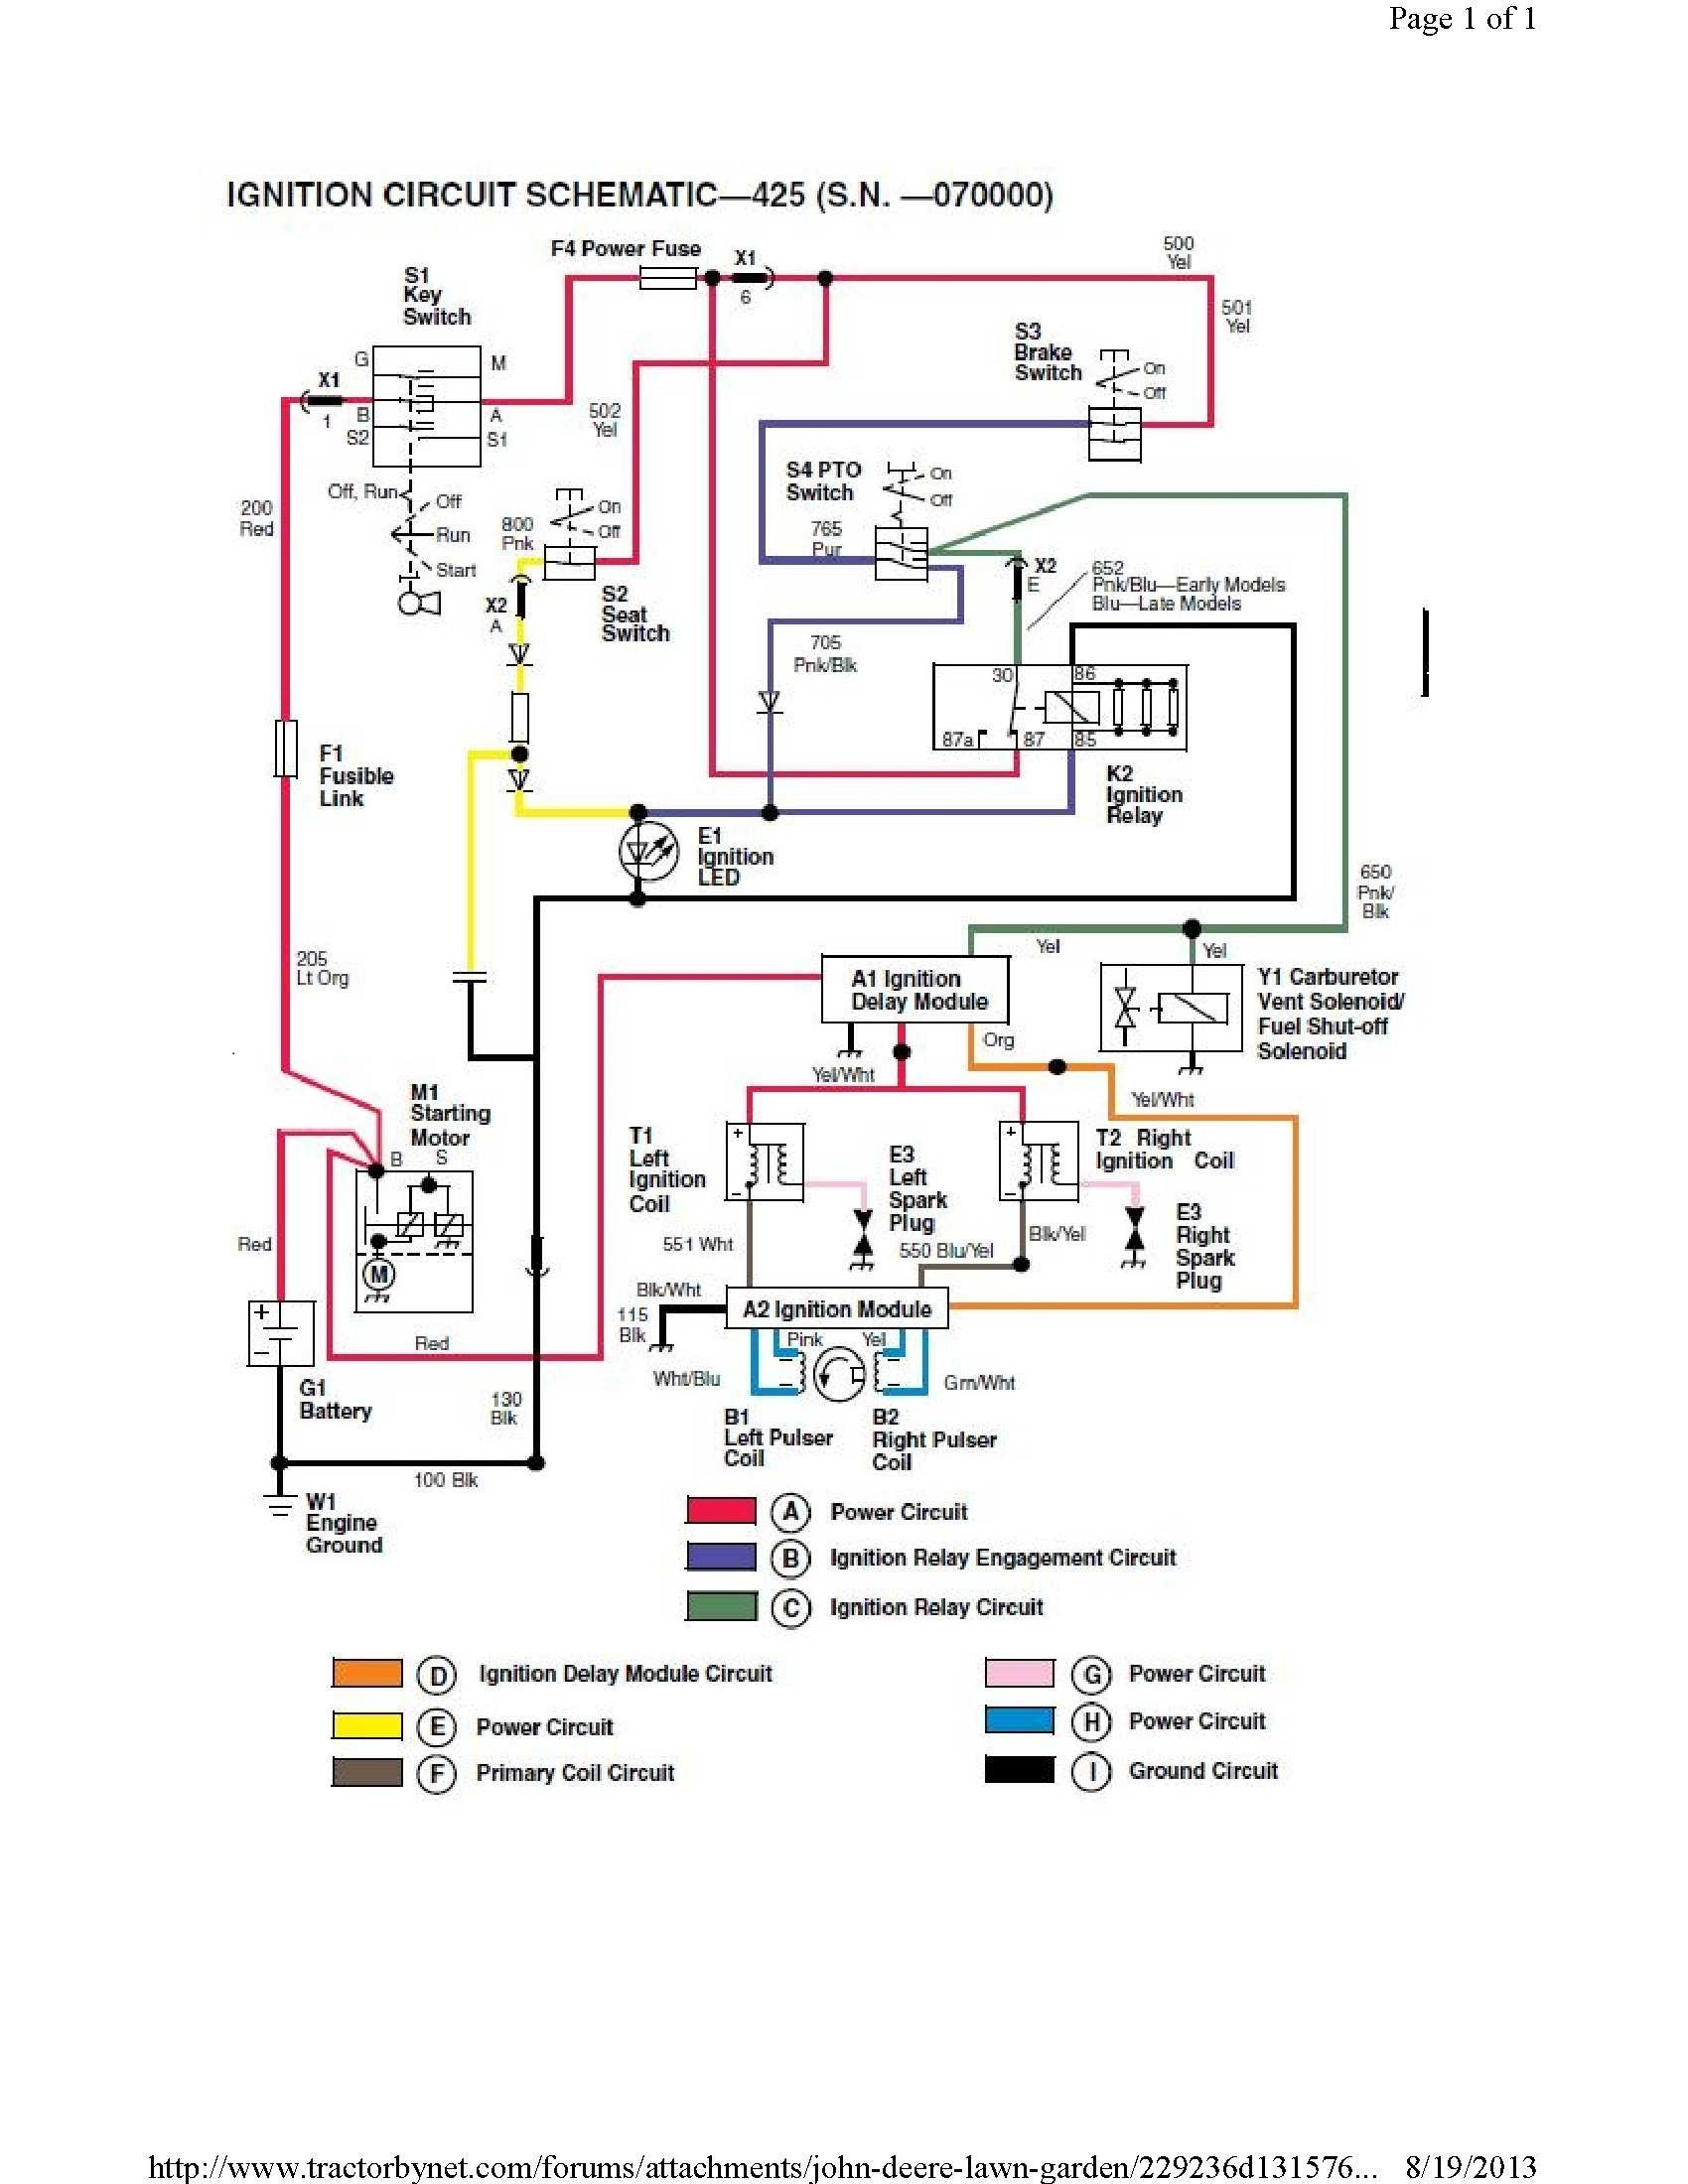 John Deere 316 Electric Clutch Wiring Diagram Library. John Deere L120 Wiring Diagram 425 Pto 318. John Deere. John Deere L110 Steering Diagram At Scoala.co